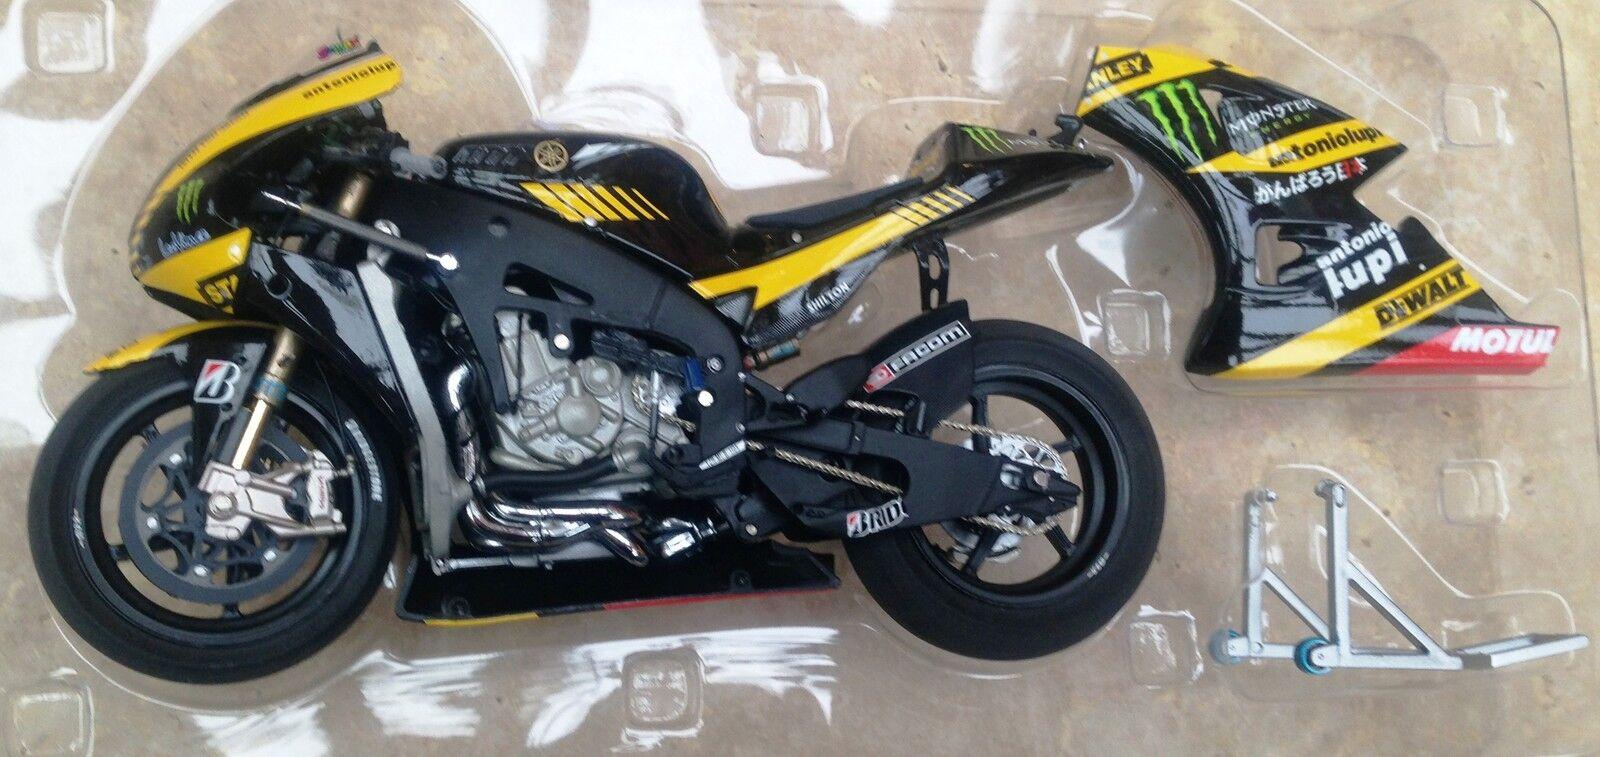 Minichamps 123 113035 Yamaha YZR M1 modello BIKE Cal Crutchlow MotoGP 2011 1:12th